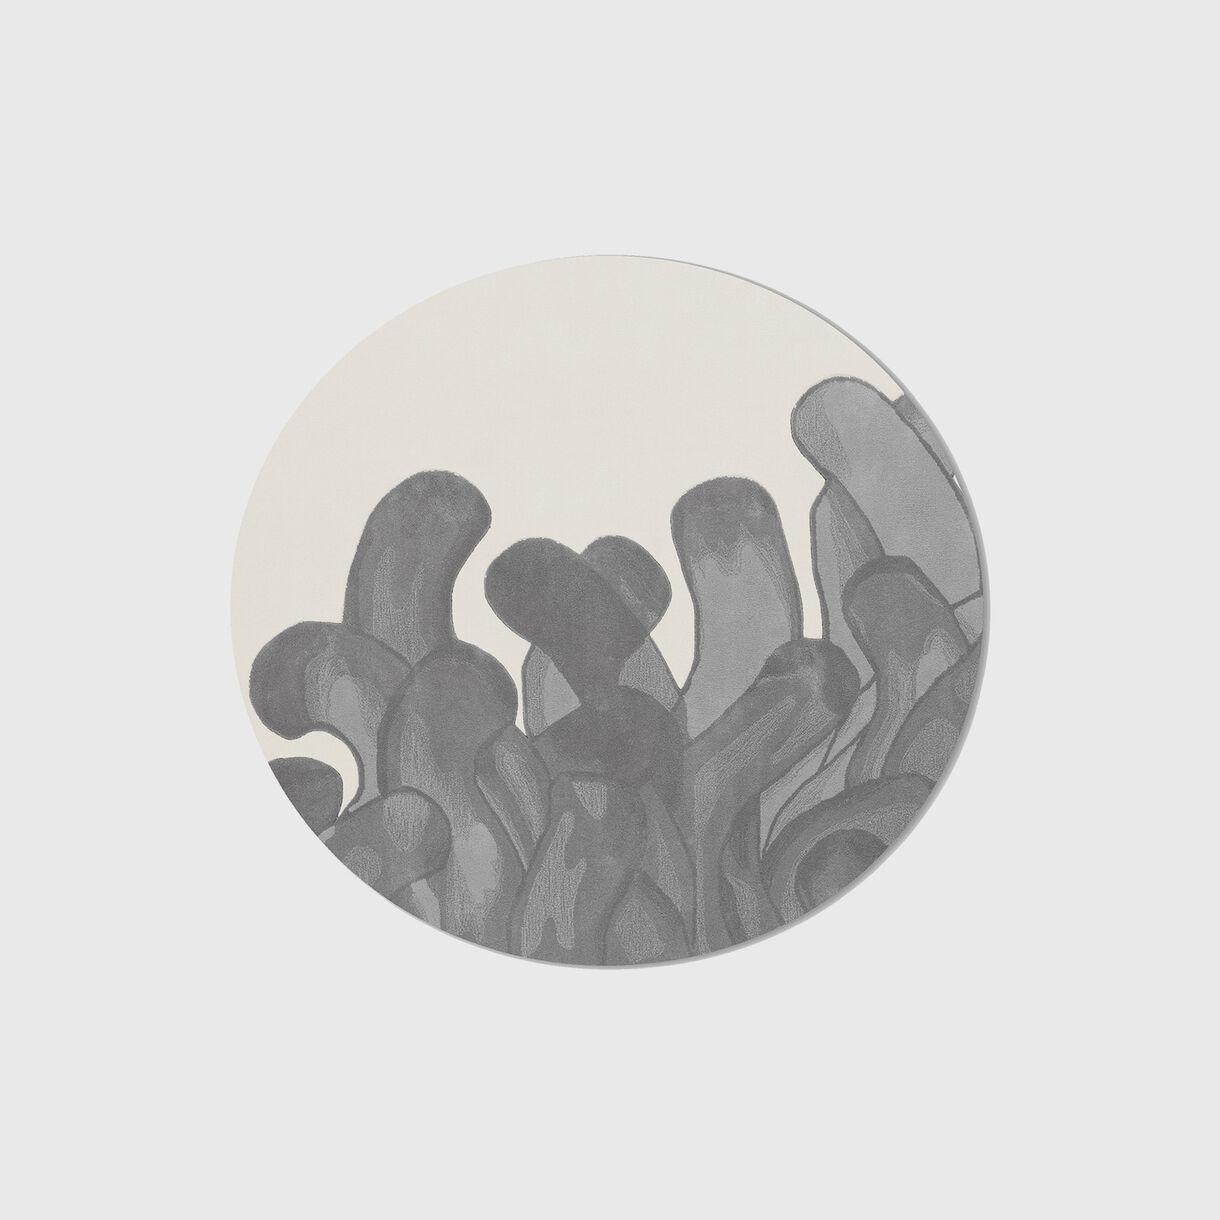 Anemone Rug, Round, Grey